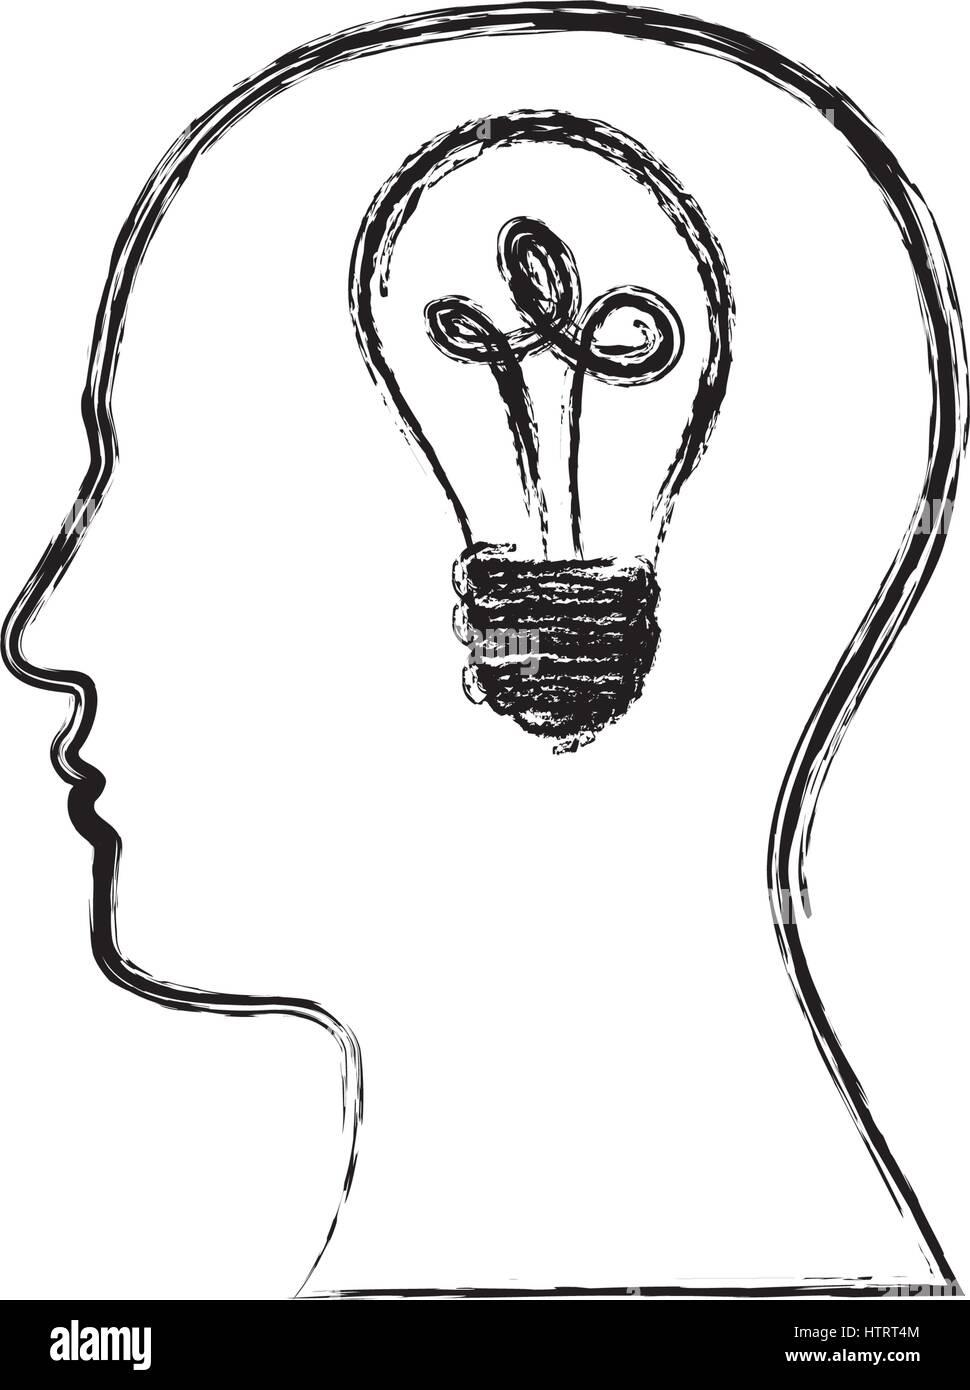 Dibujo monocromo de silueta humana con bombilla en mente Imagen De Stock